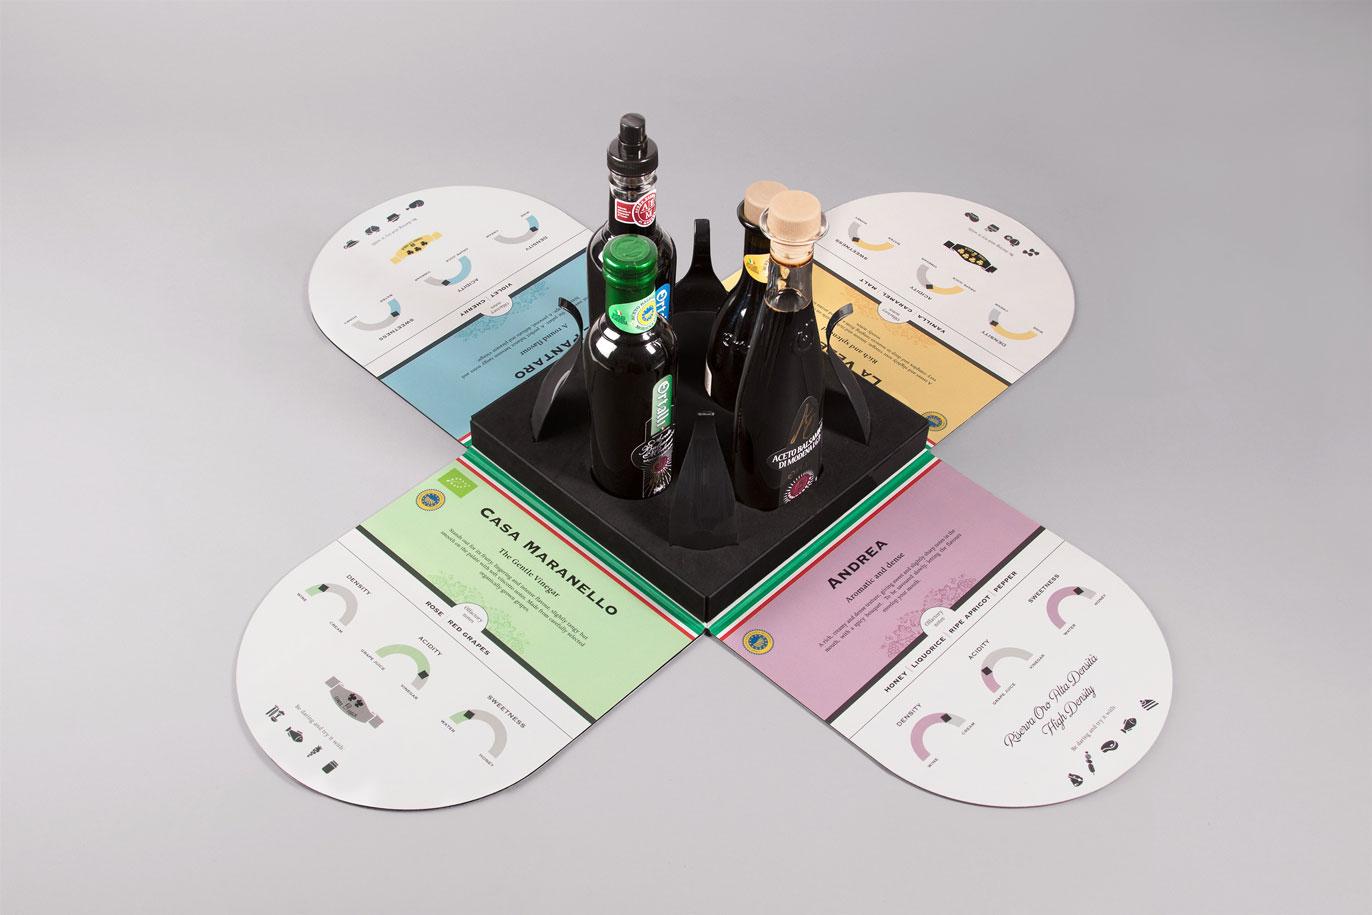 Ortalli packaging selling kit creativitat disseny gràfic nous formats Vibranding